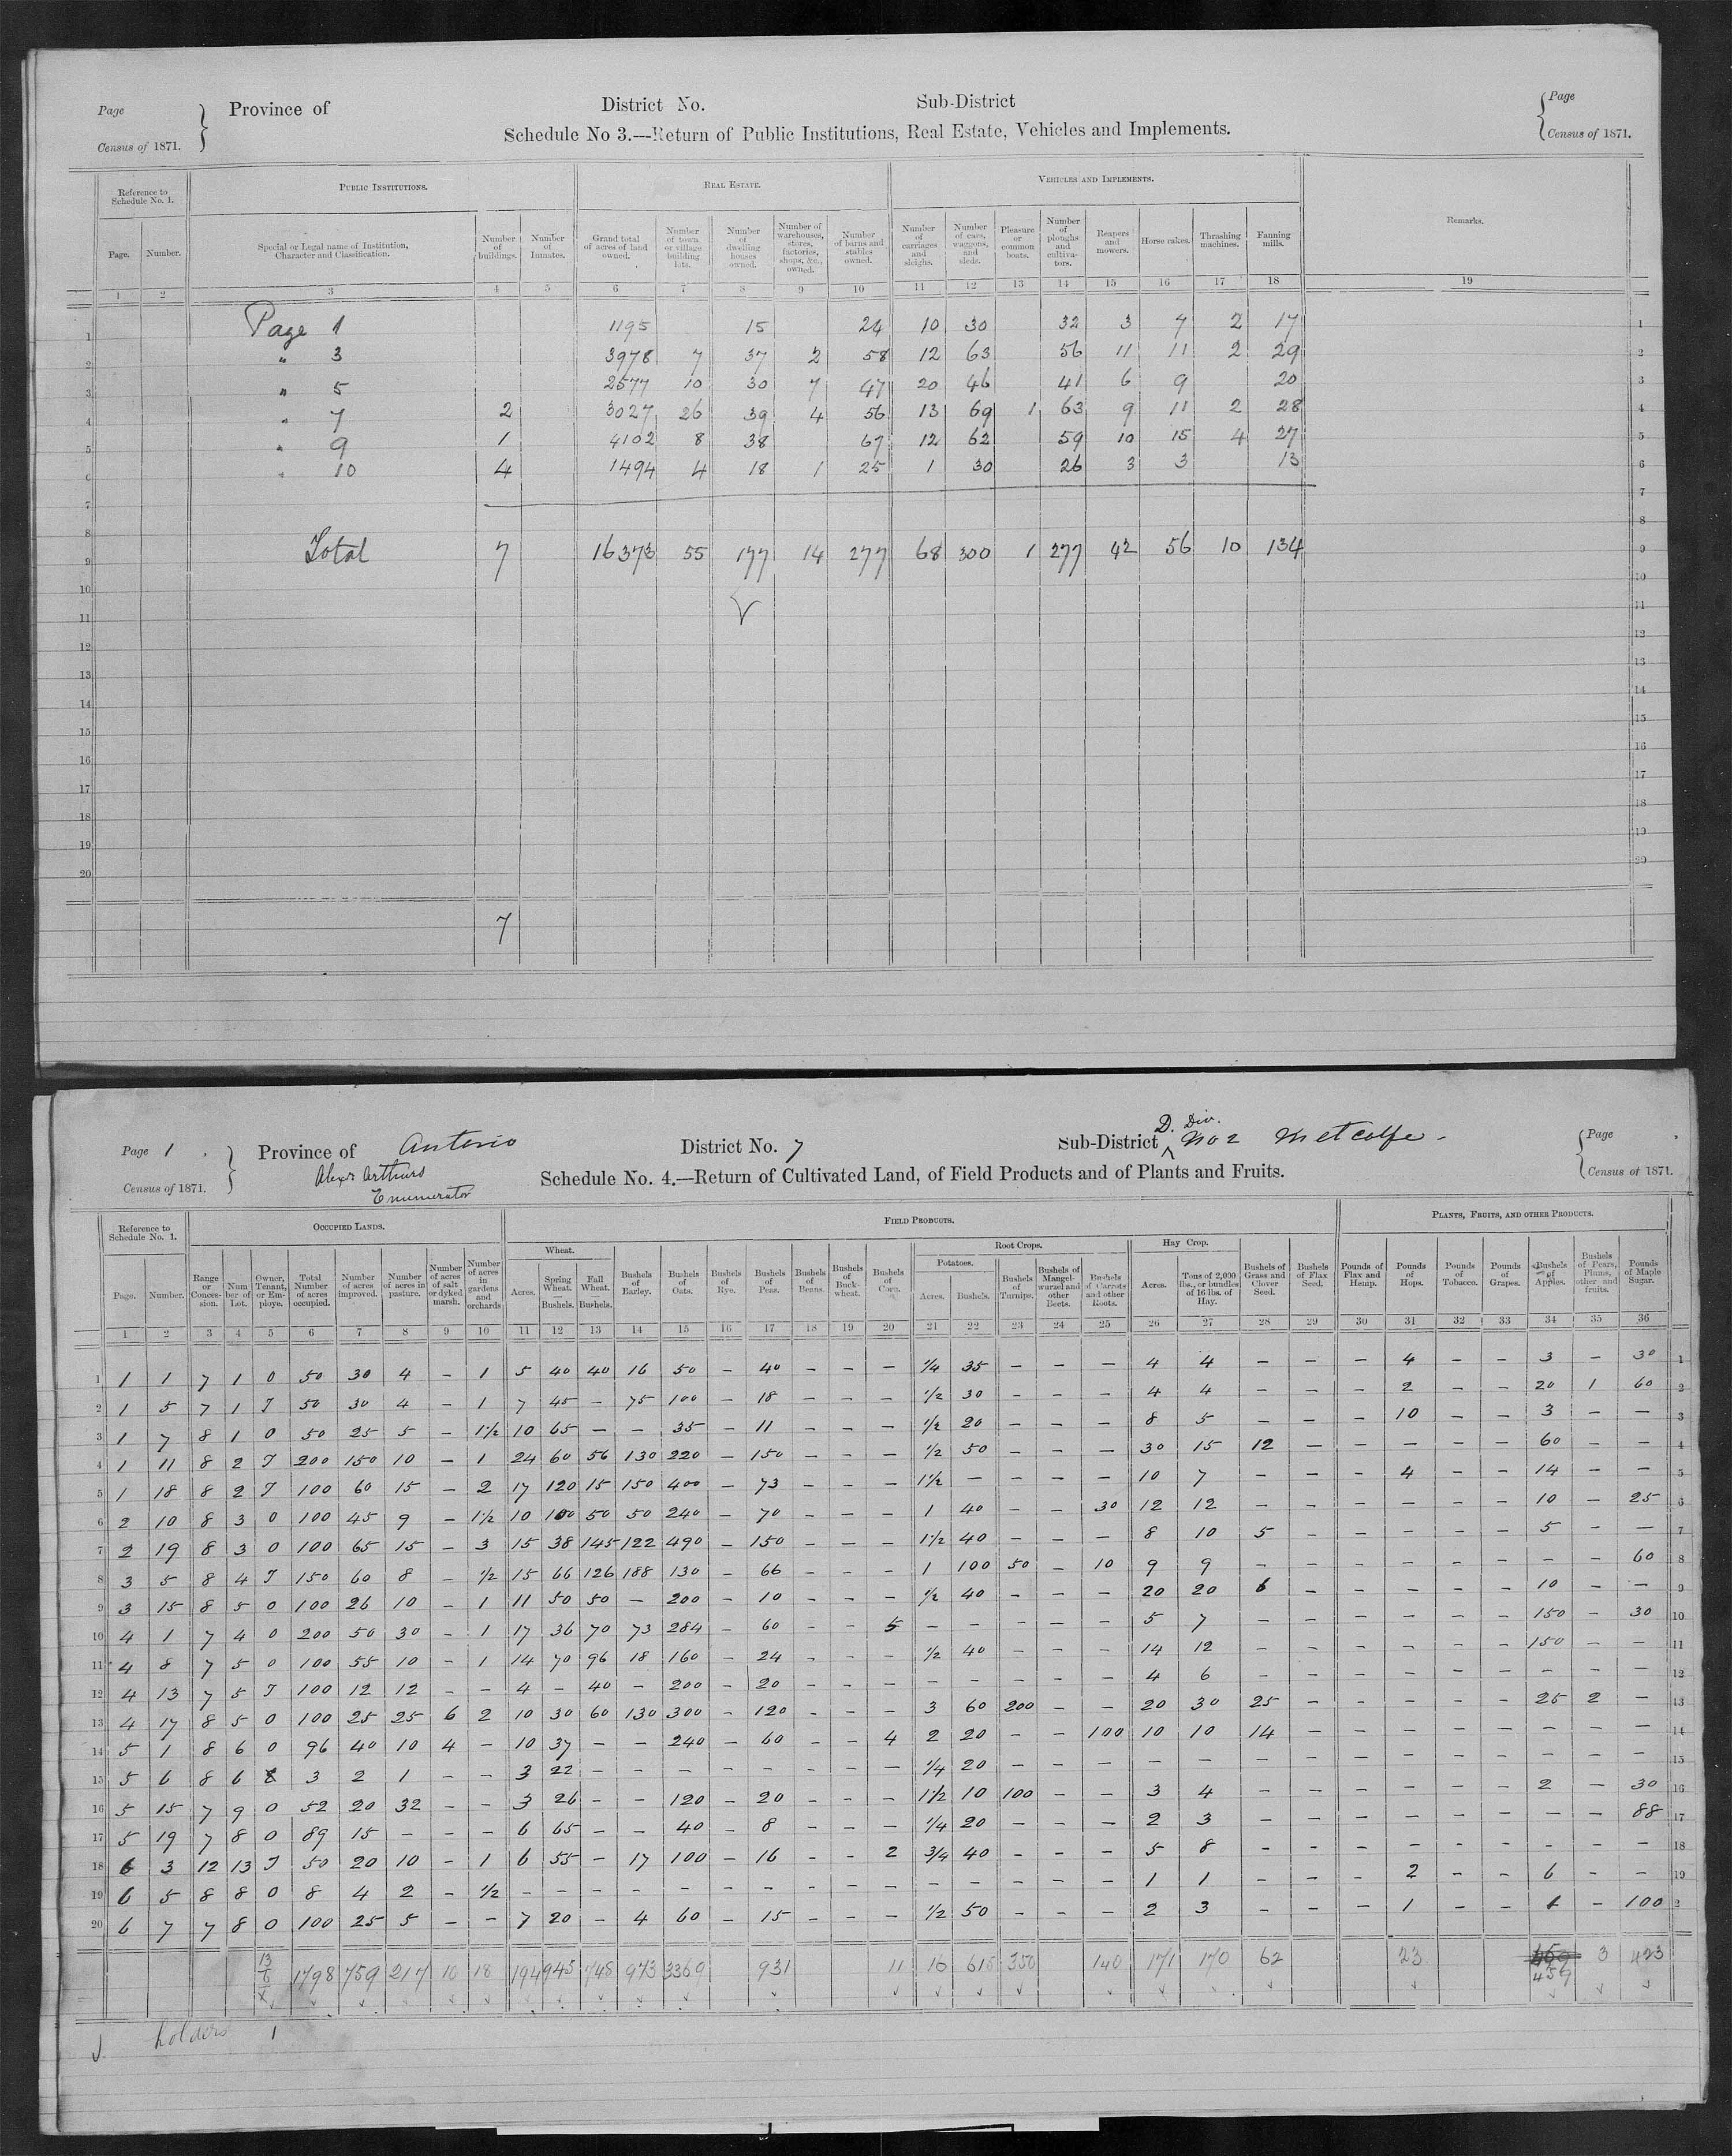 Titre: Recensement du Canada (1871) - N° d'enregistrement Mikan: 194056 - Microforme: c-9901